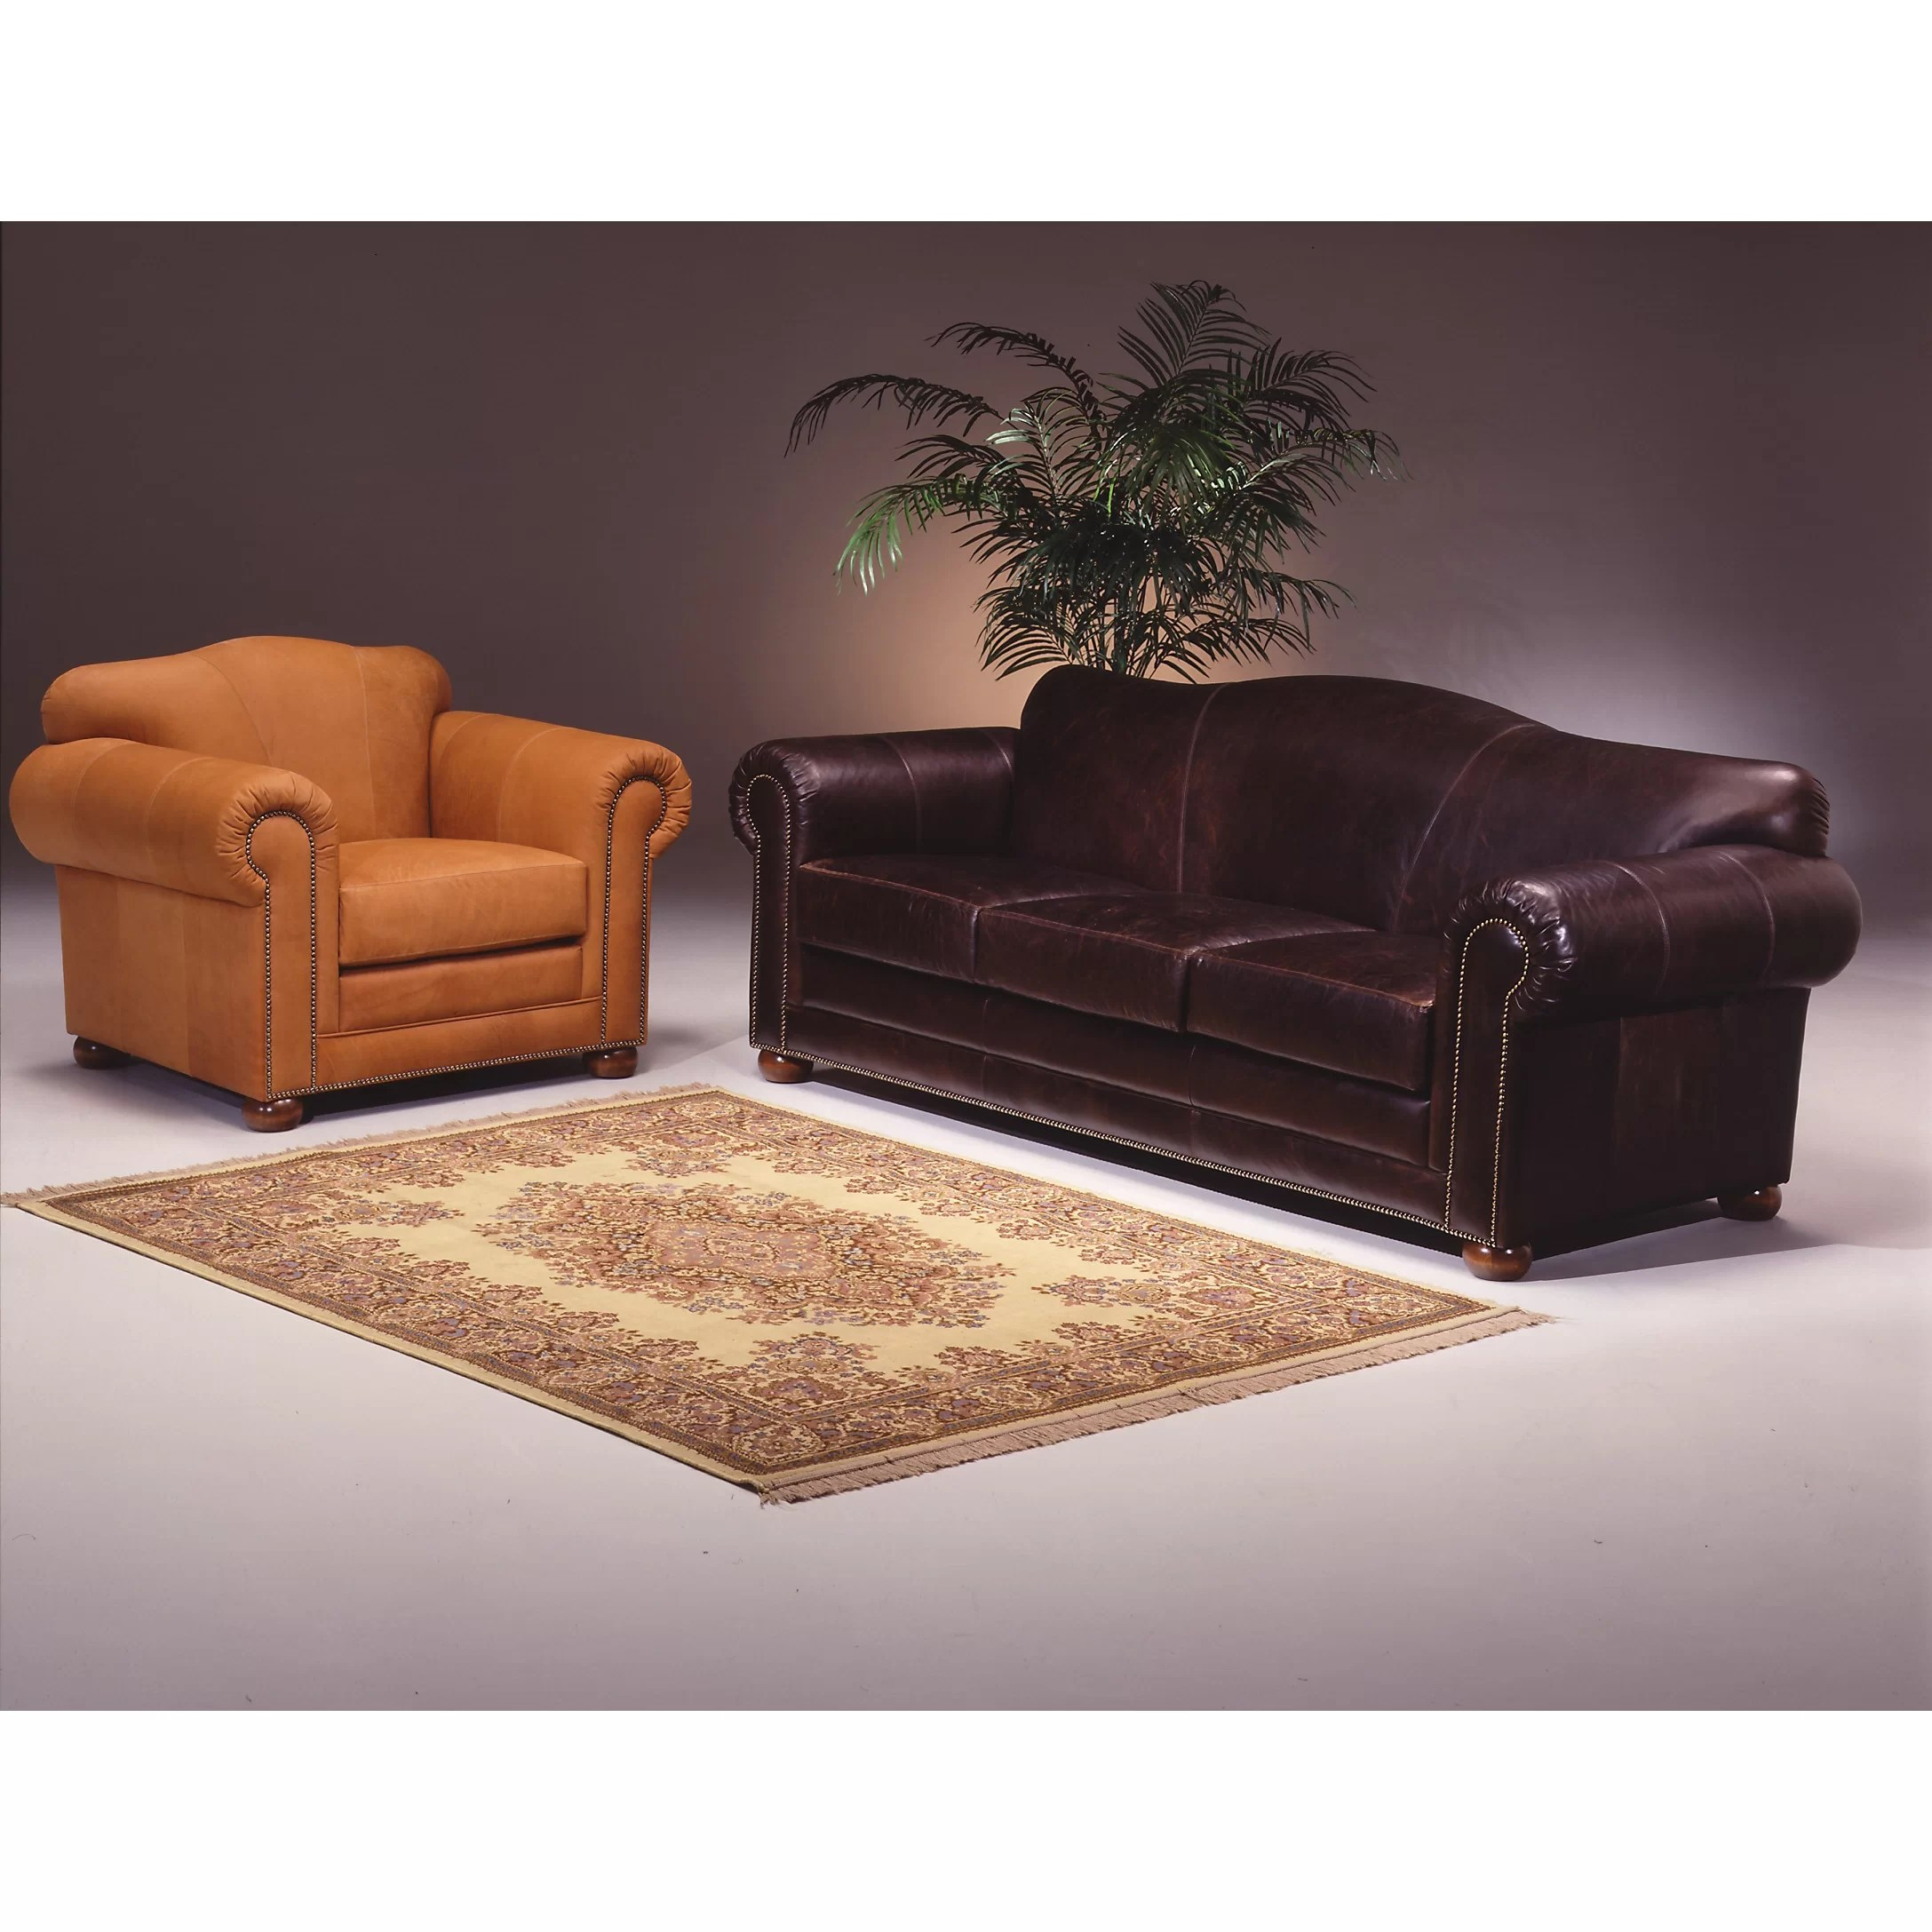 omnia leather sofa beds corner units uk sedona and reviews wayfair